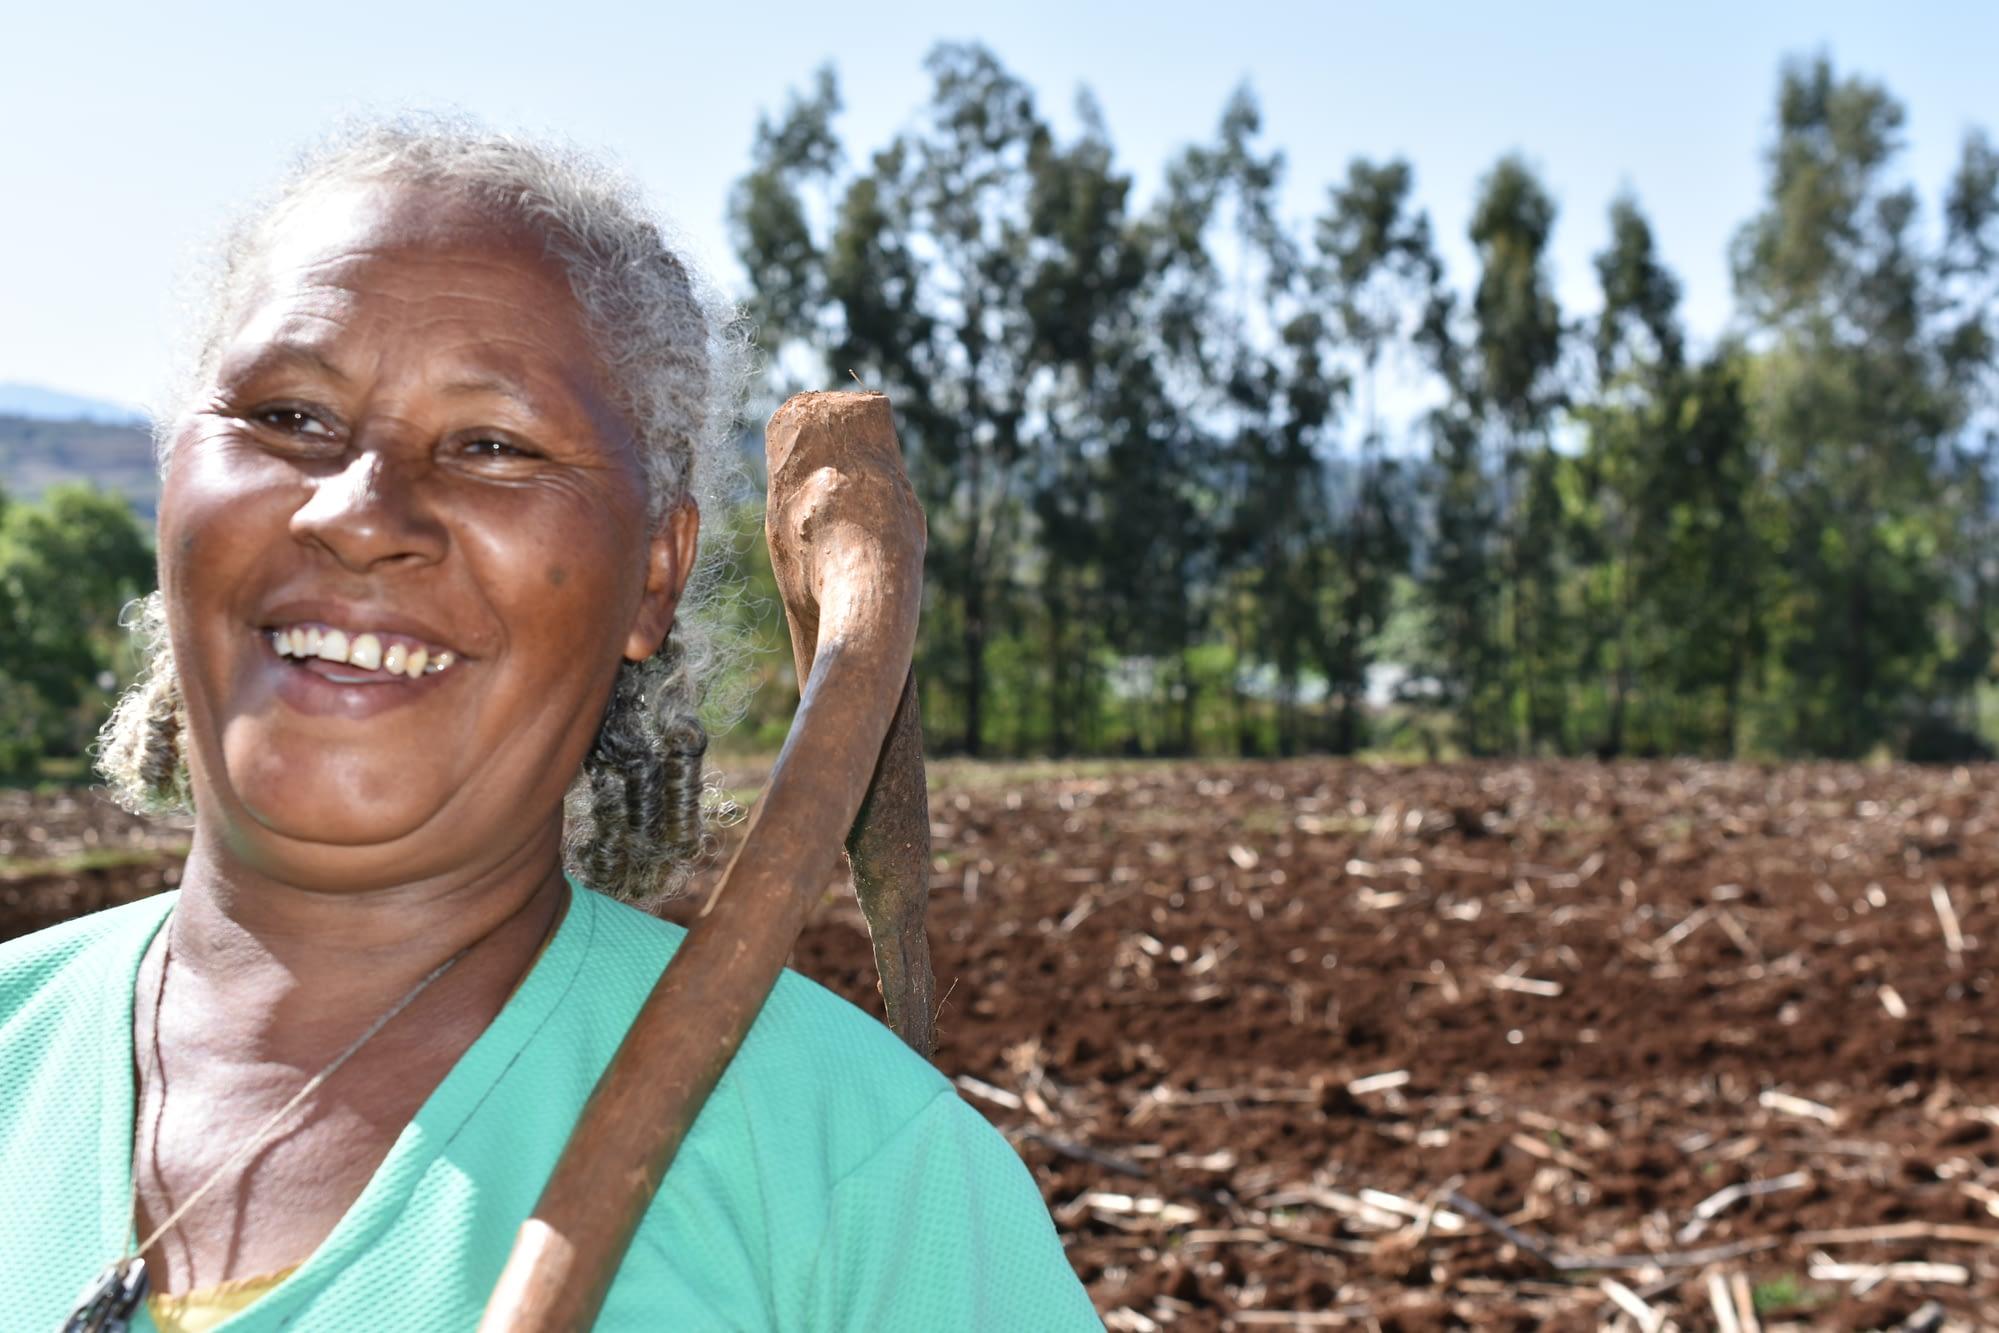 Sequare Regassa stands next to her fields holding a wooden farming tool. (Photo: Simret Yasabu/CIMMYT)